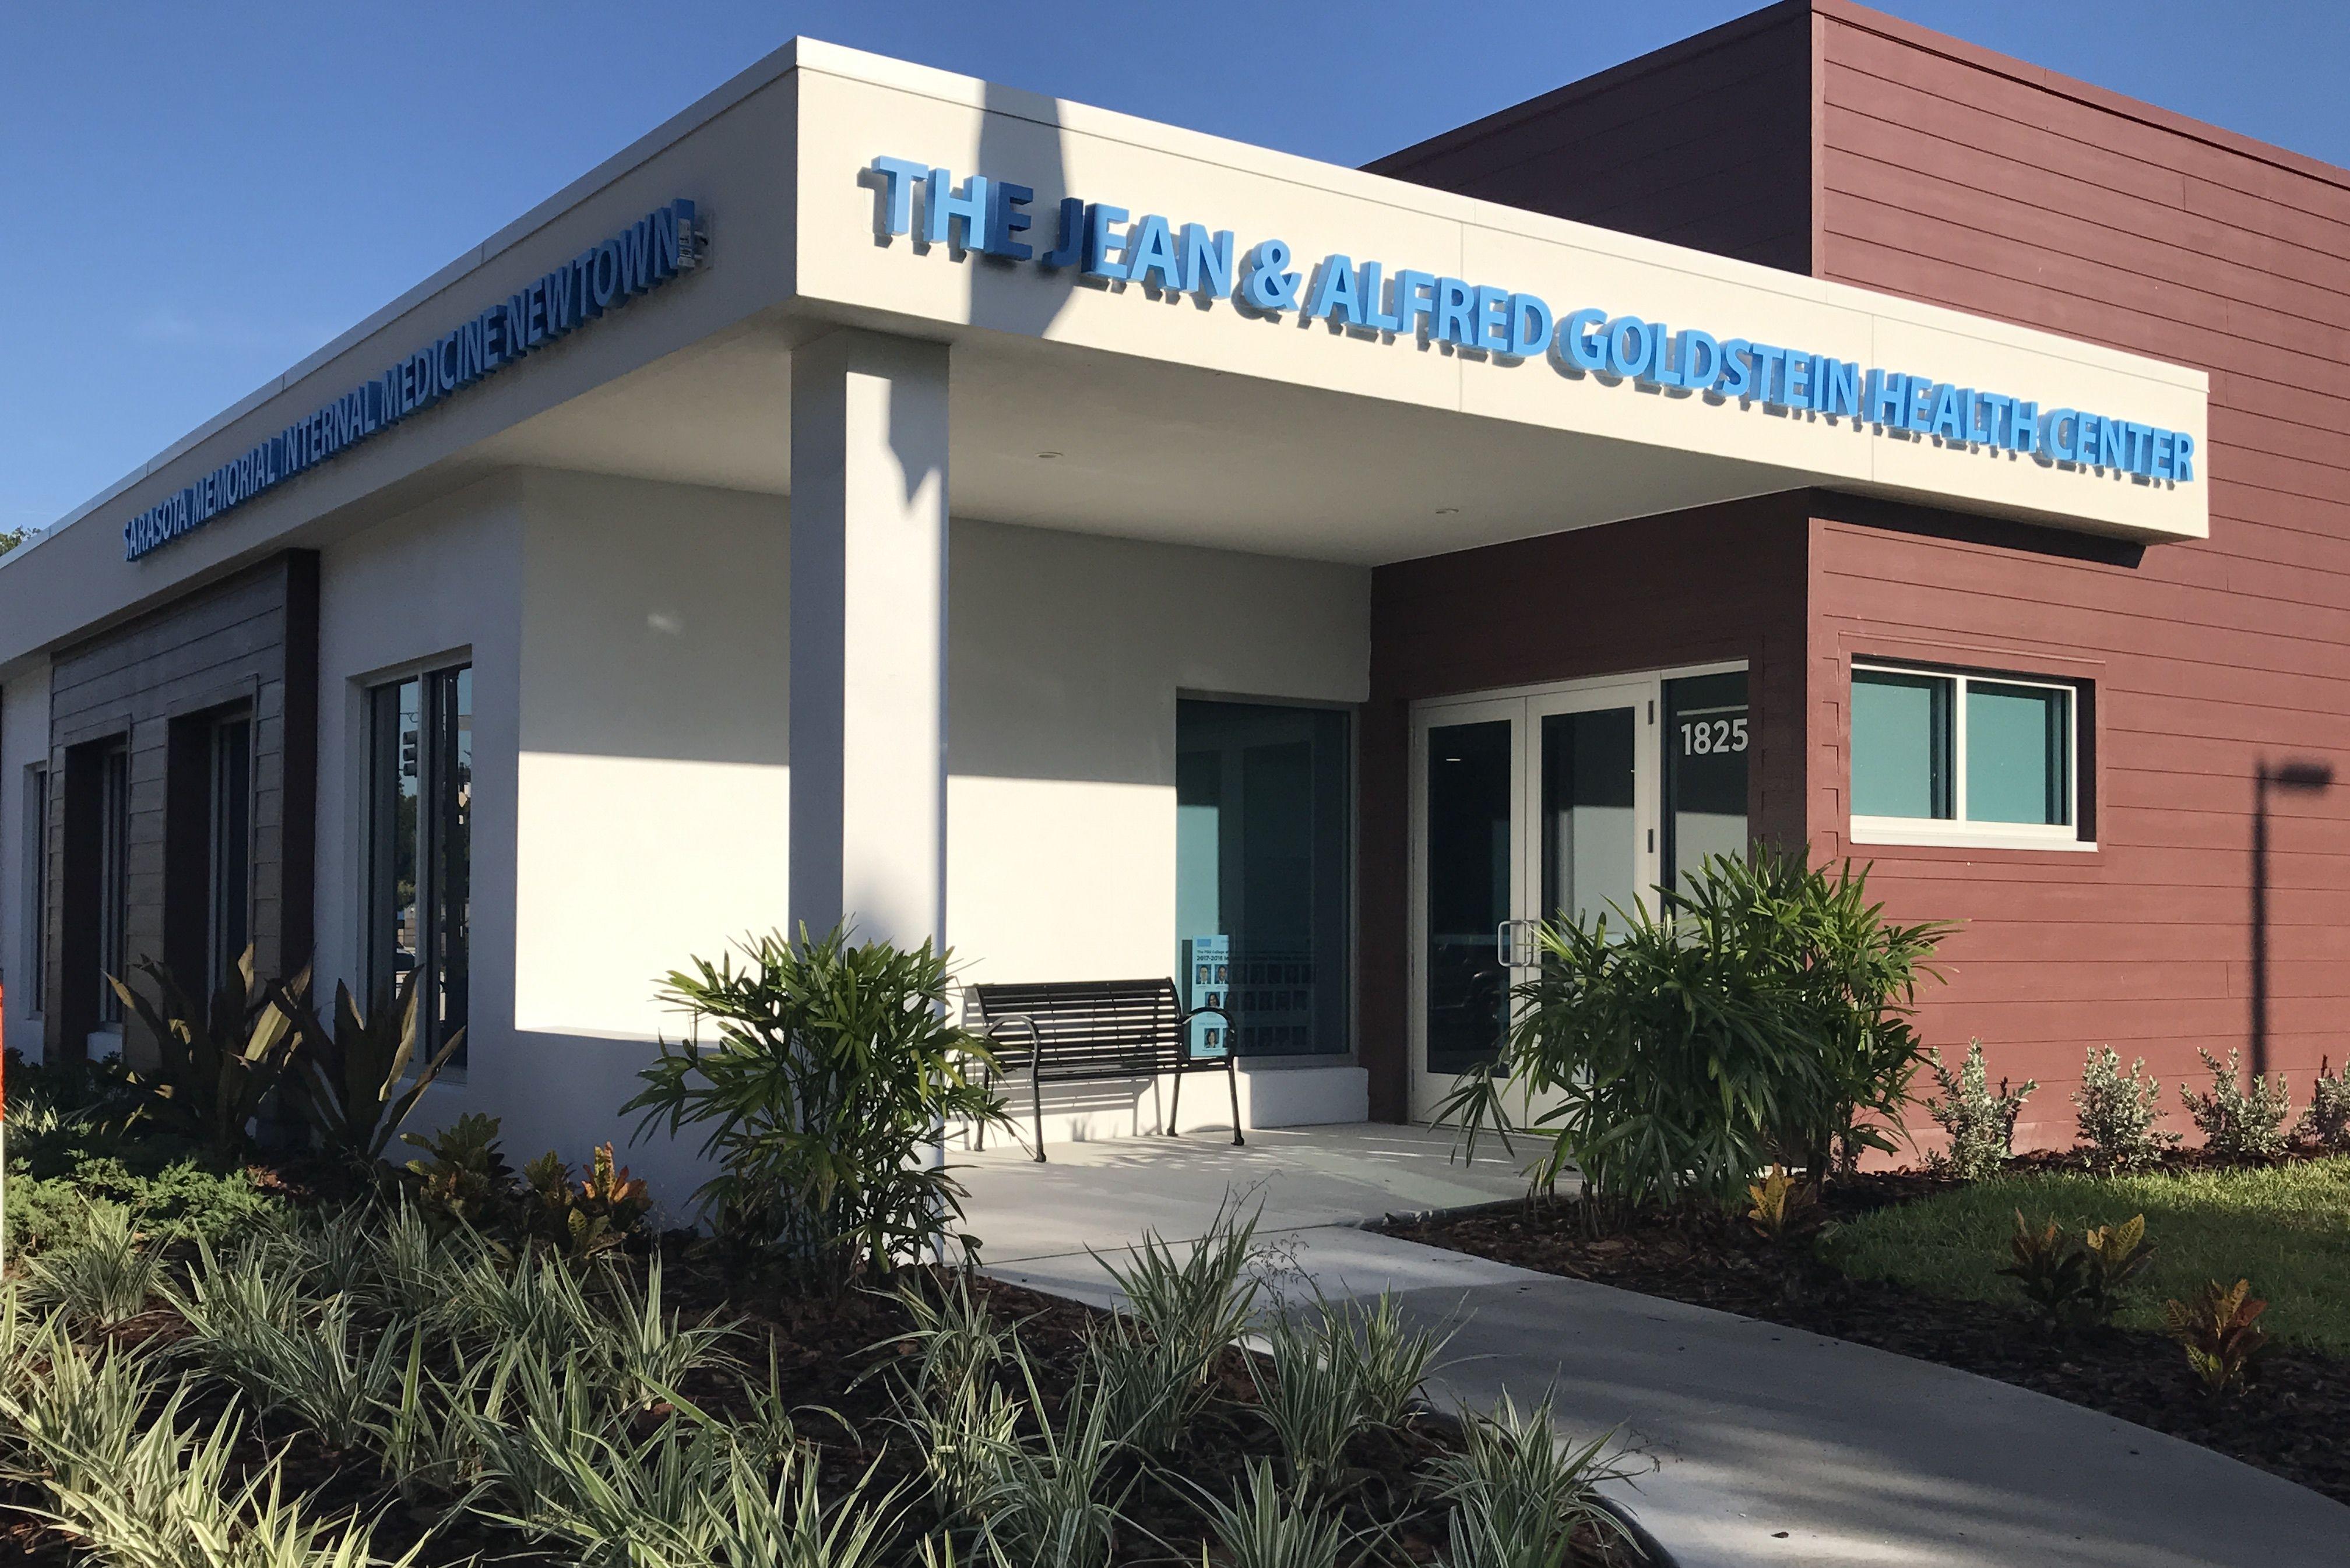 Sarasota memorial health care system newtown practice czljko